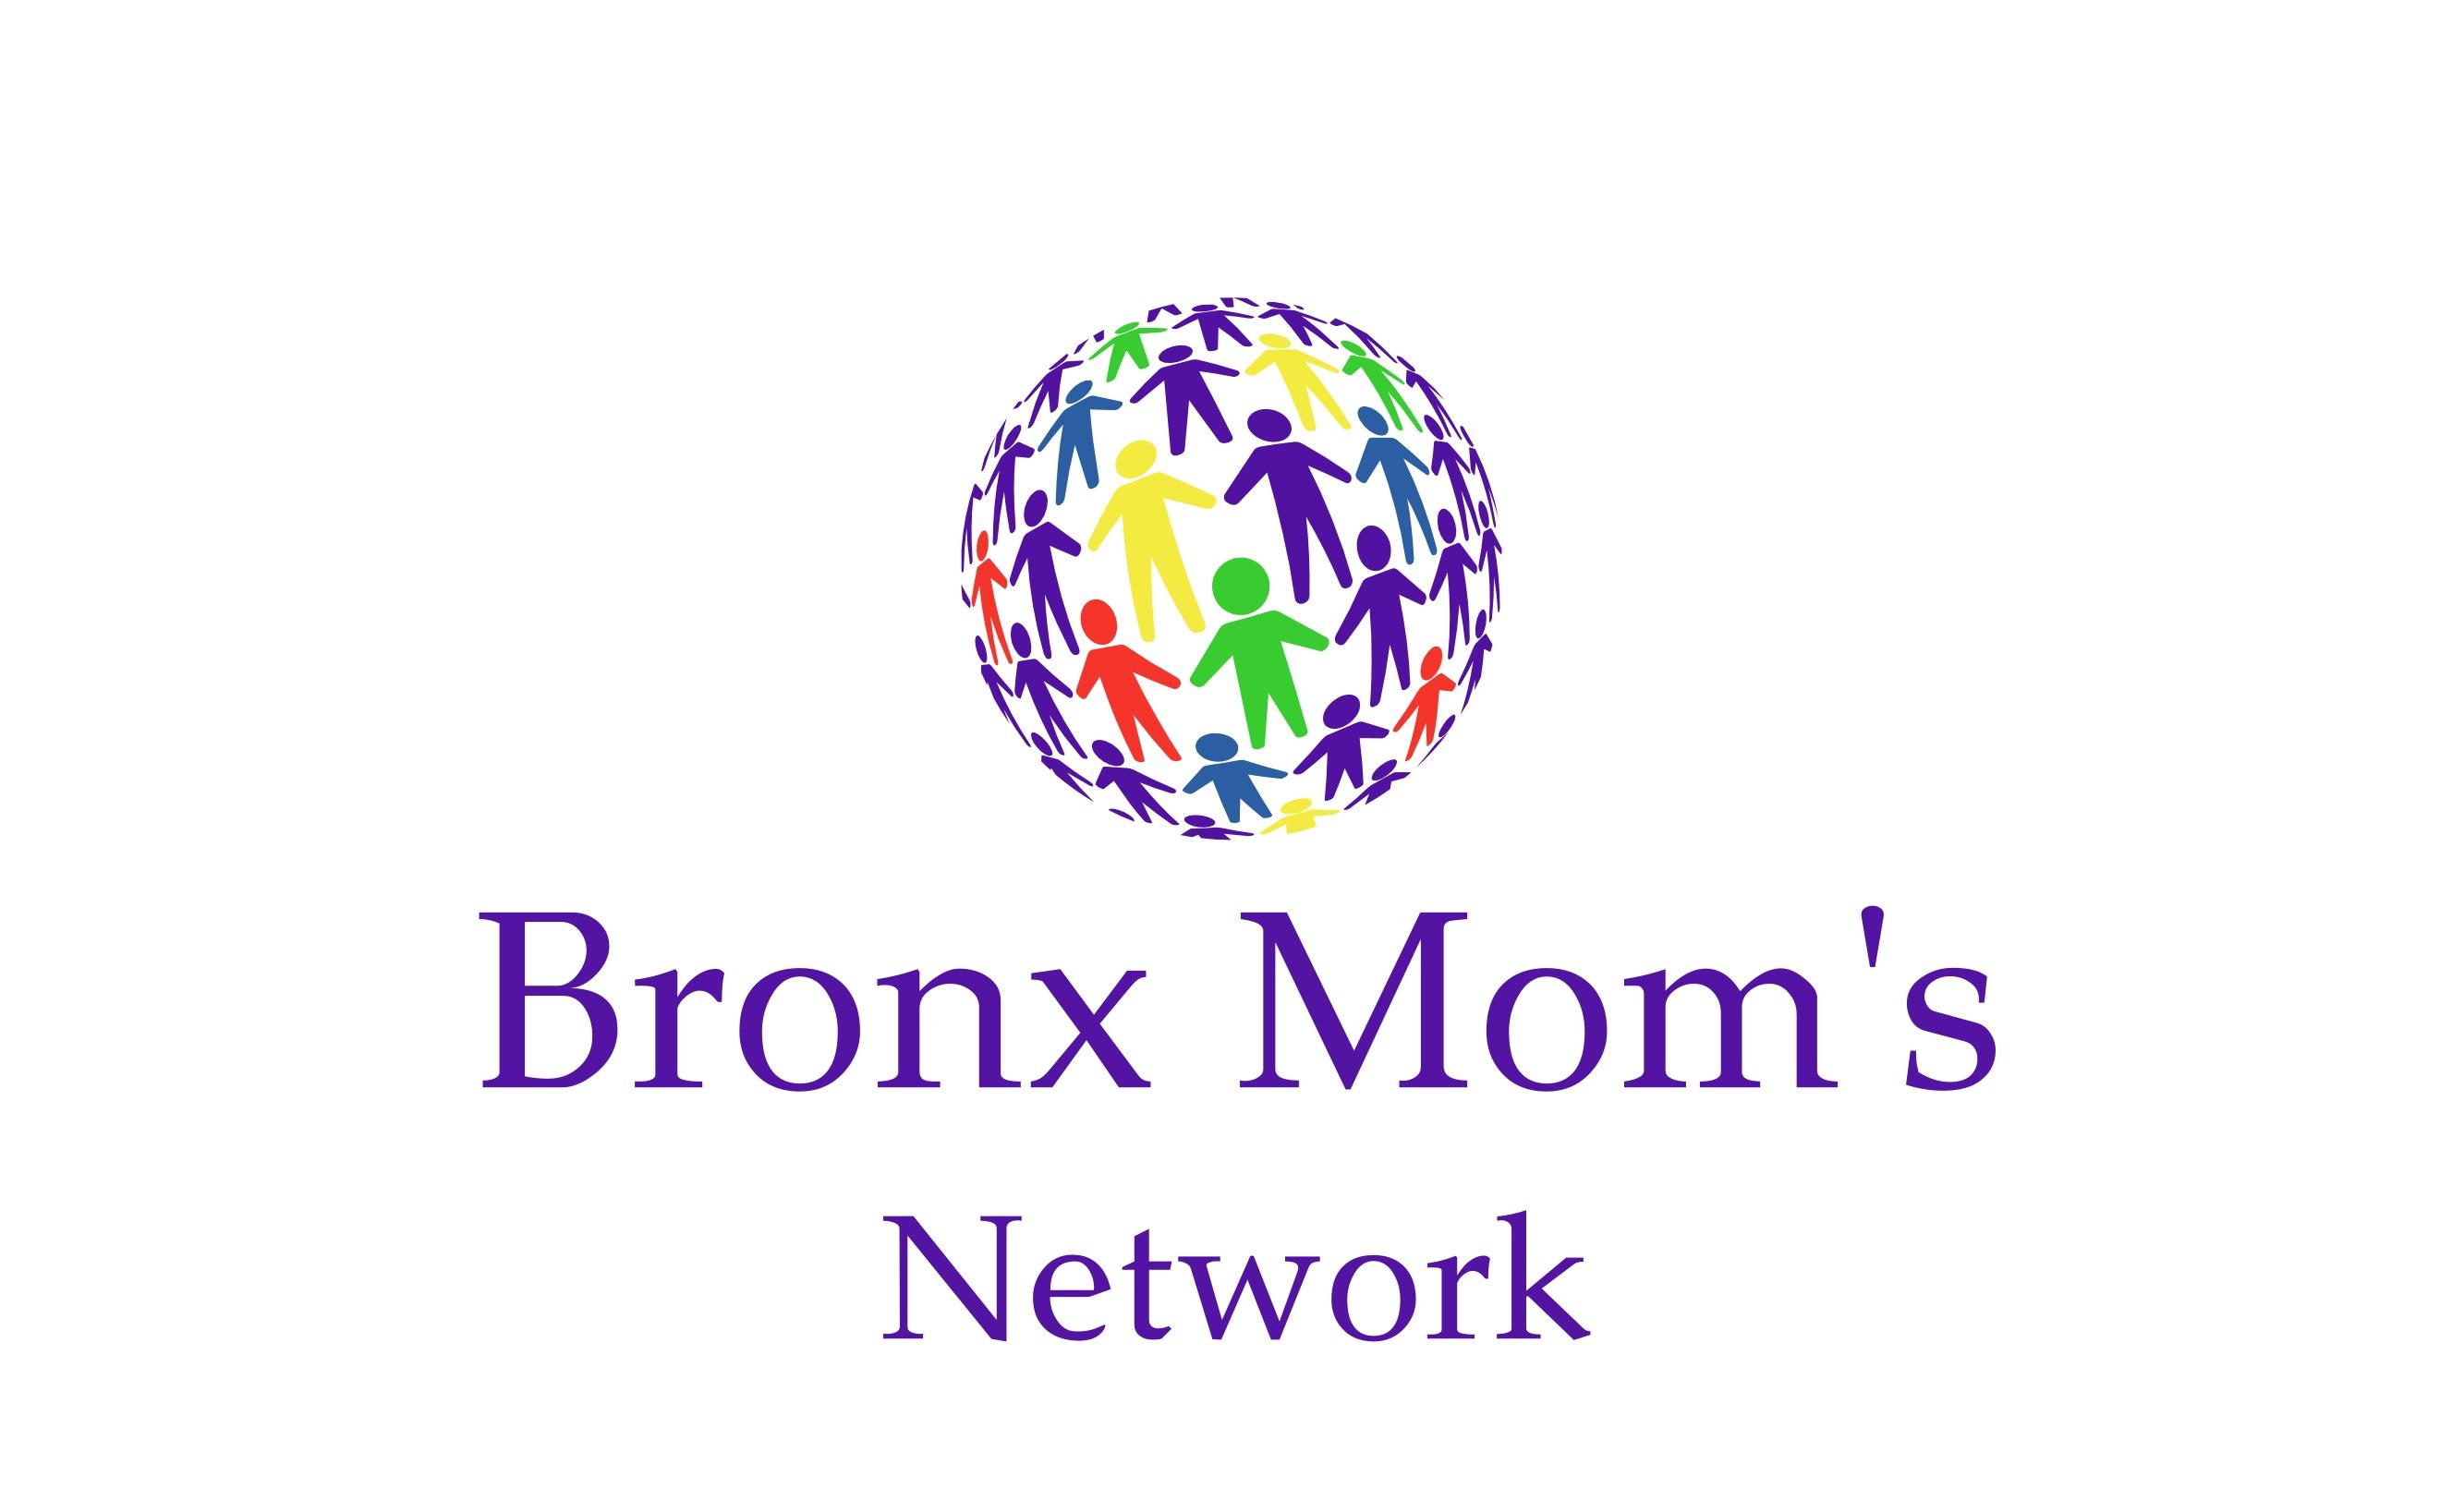 Bronx Mom's Network LLC